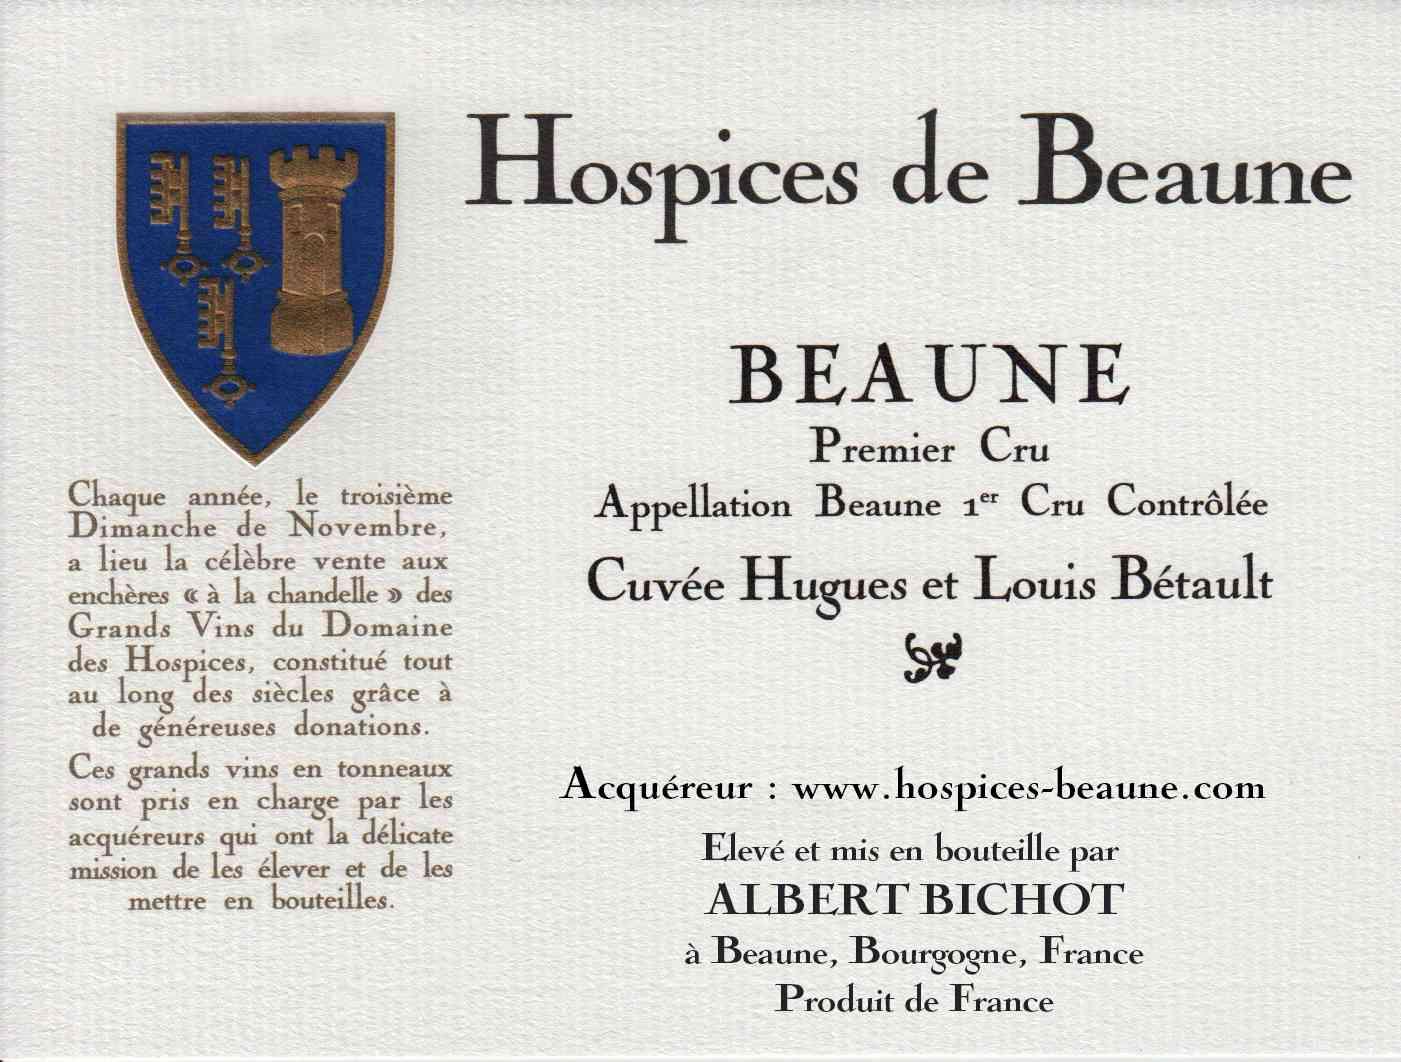 Encheres-auction-HospicesdeBeaune-AlbertBichot-Beaune1erCru-Cuvee-HughesetLouisBetault